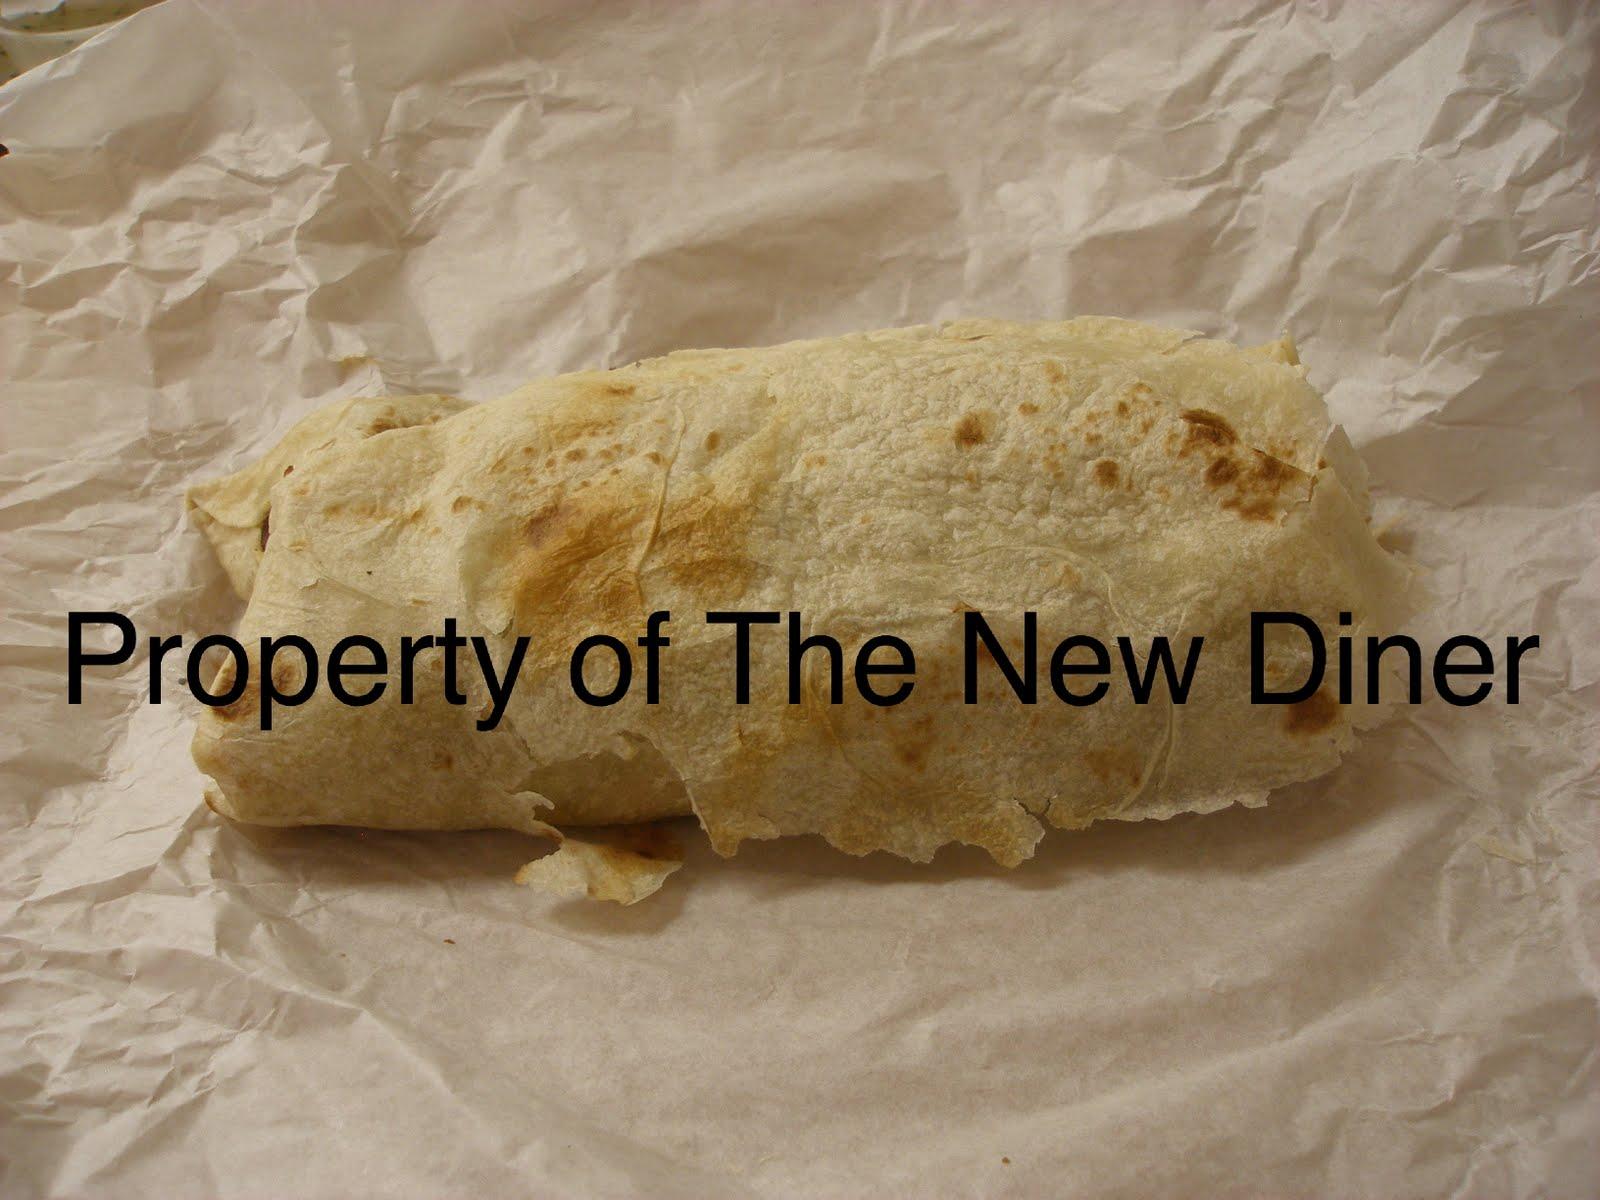 The New Diner: Doner G Turkish & Mediterranean Grill